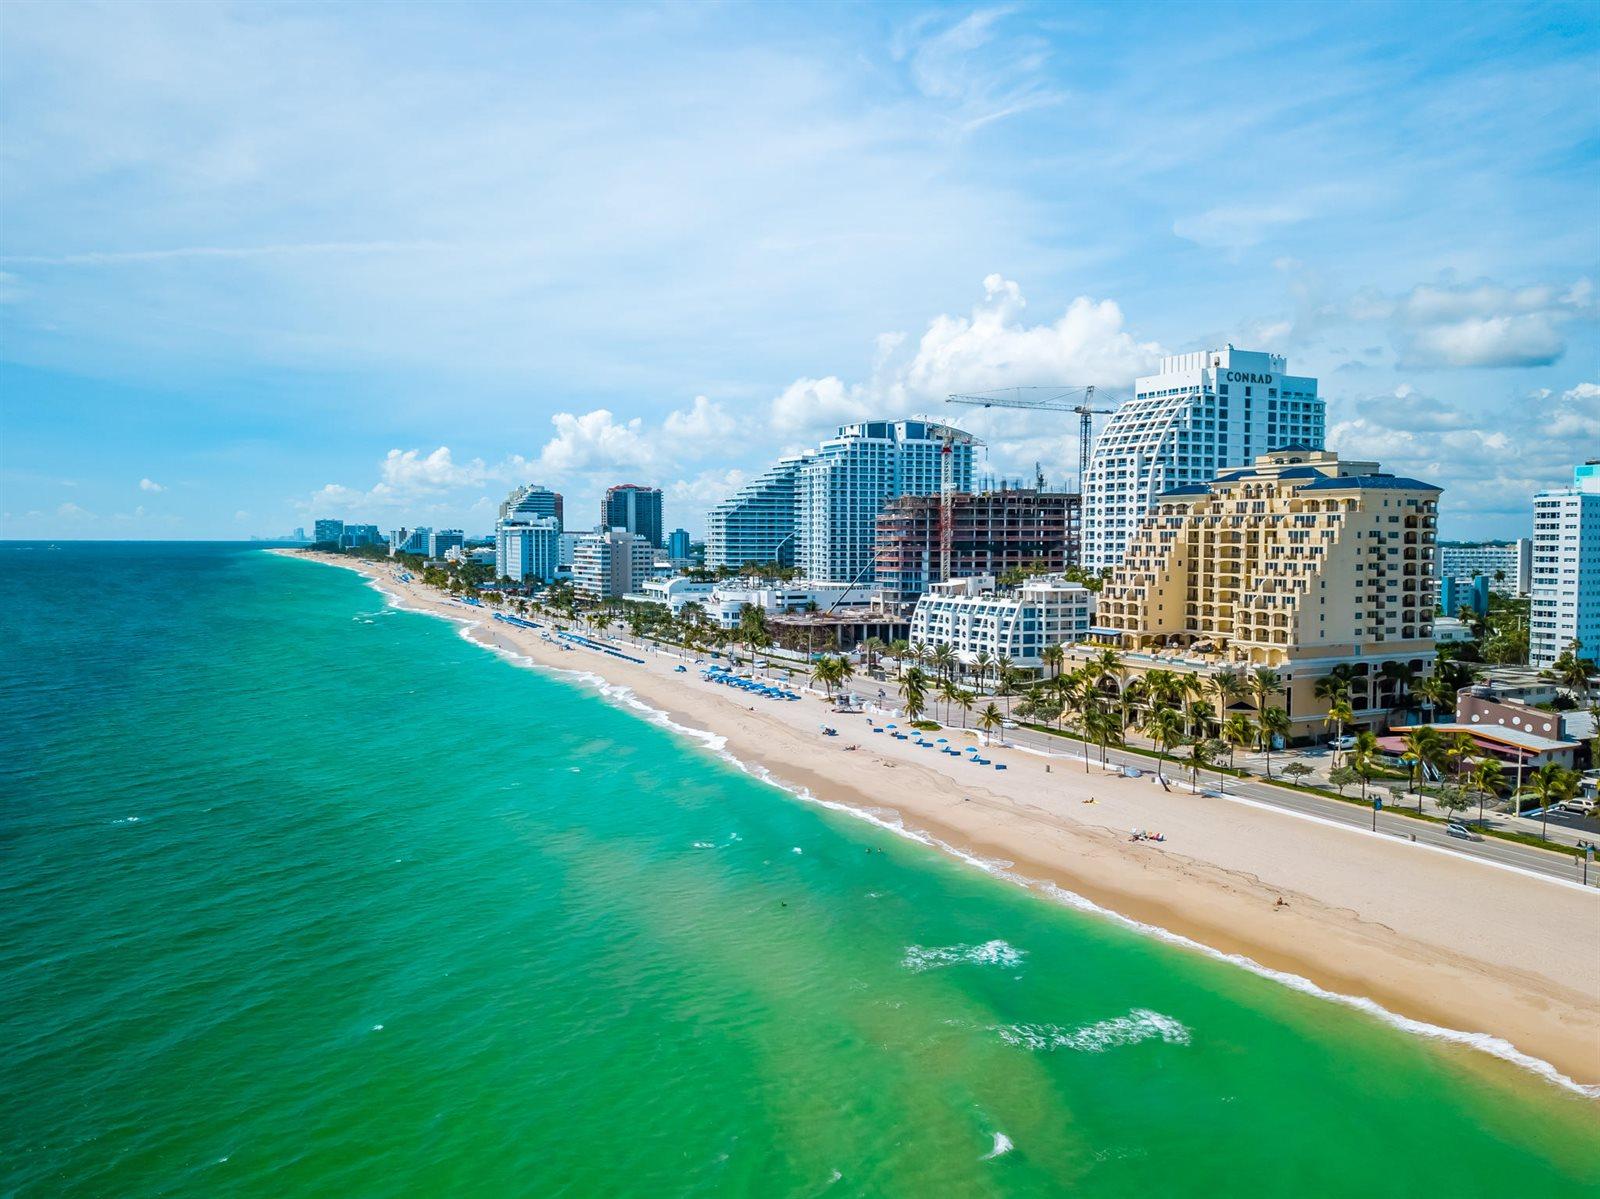 601 North Fort Lauderdale Beach Boulevard, #811, Fort Lauderdale, FL 33304